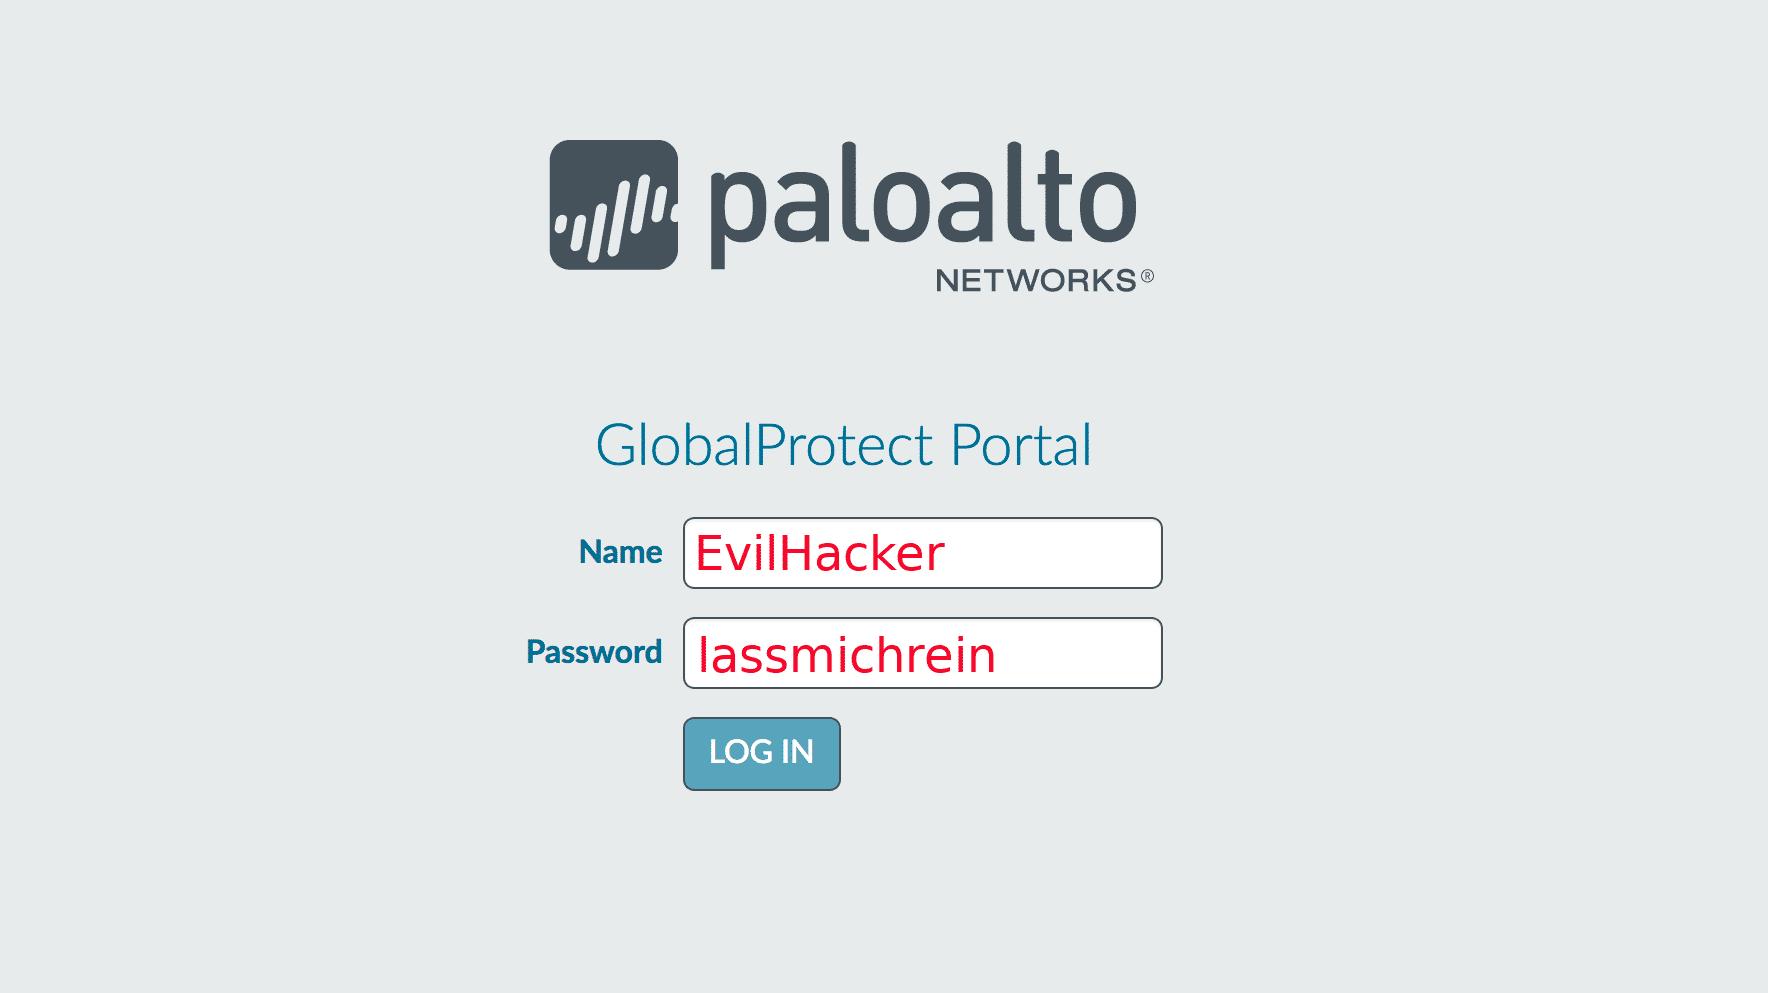 Palo Alto stümpert bei kritischer Sicherheitslücke im VPN GlobalProtect